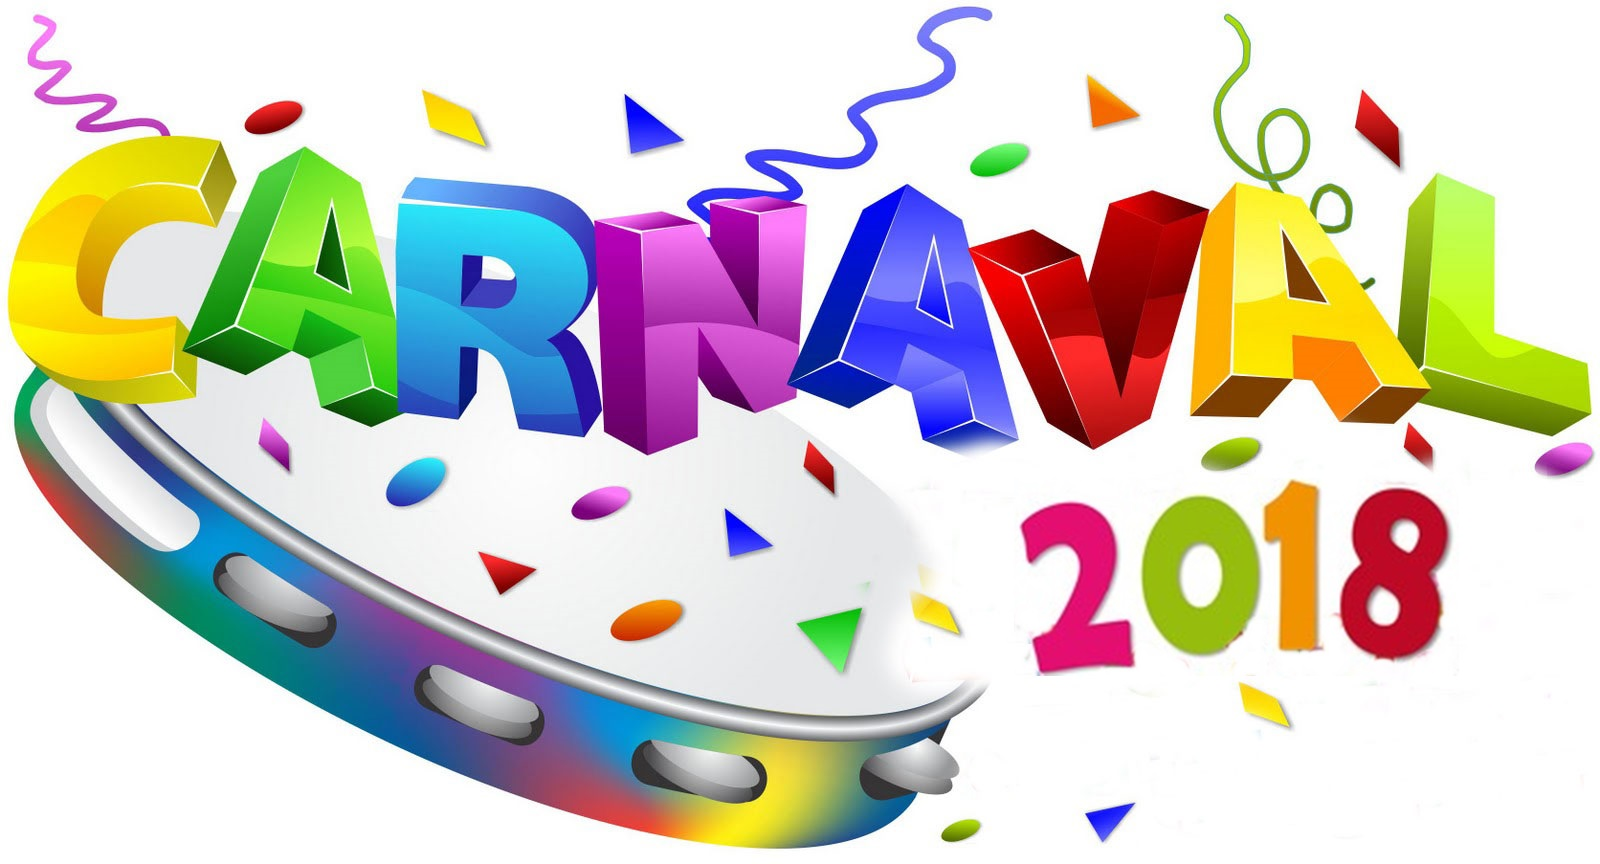 caranaval-2018_1517838155.02.jpg